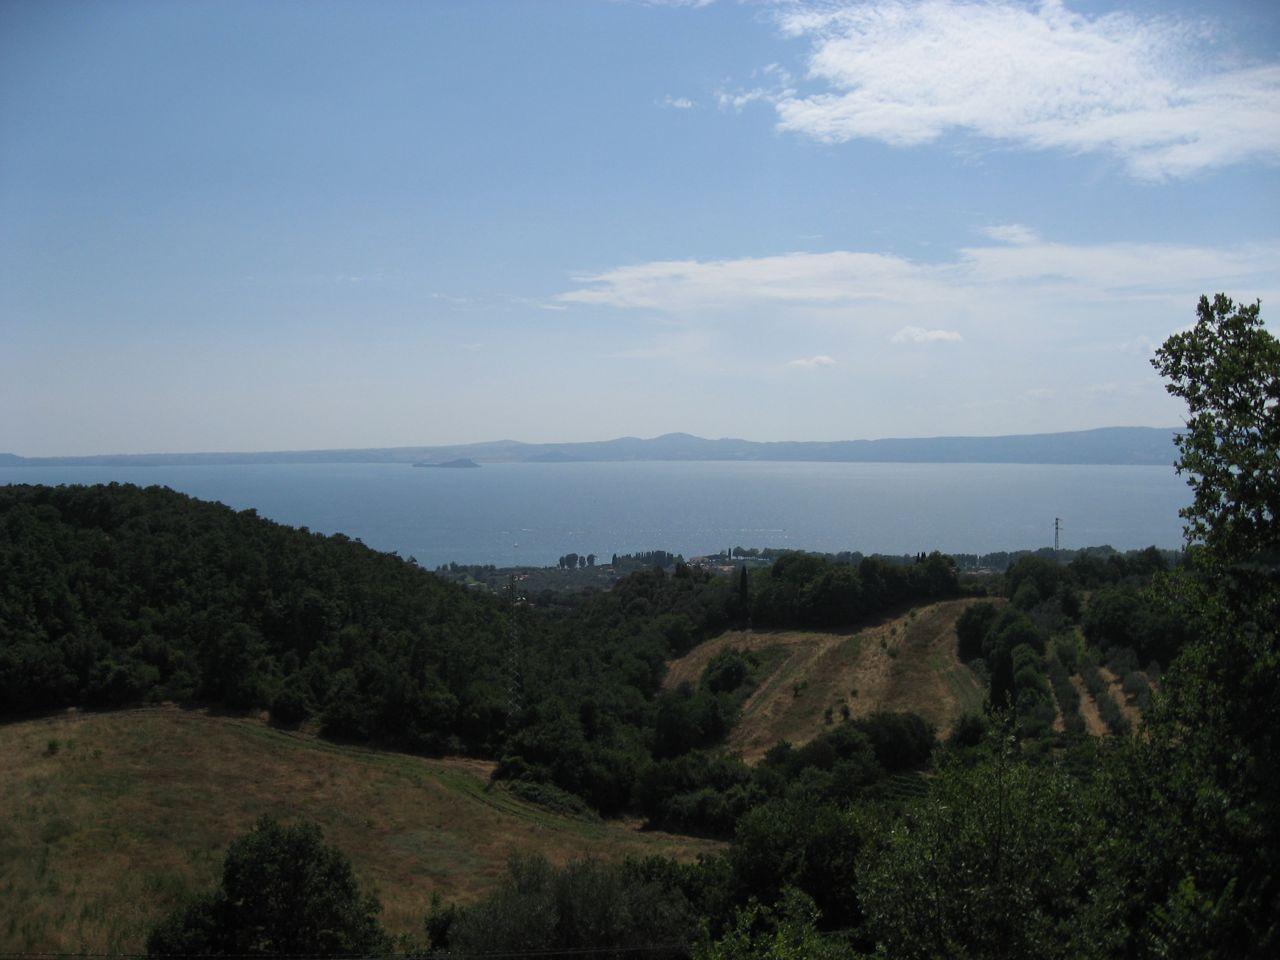 Erster Blick auf den Lago